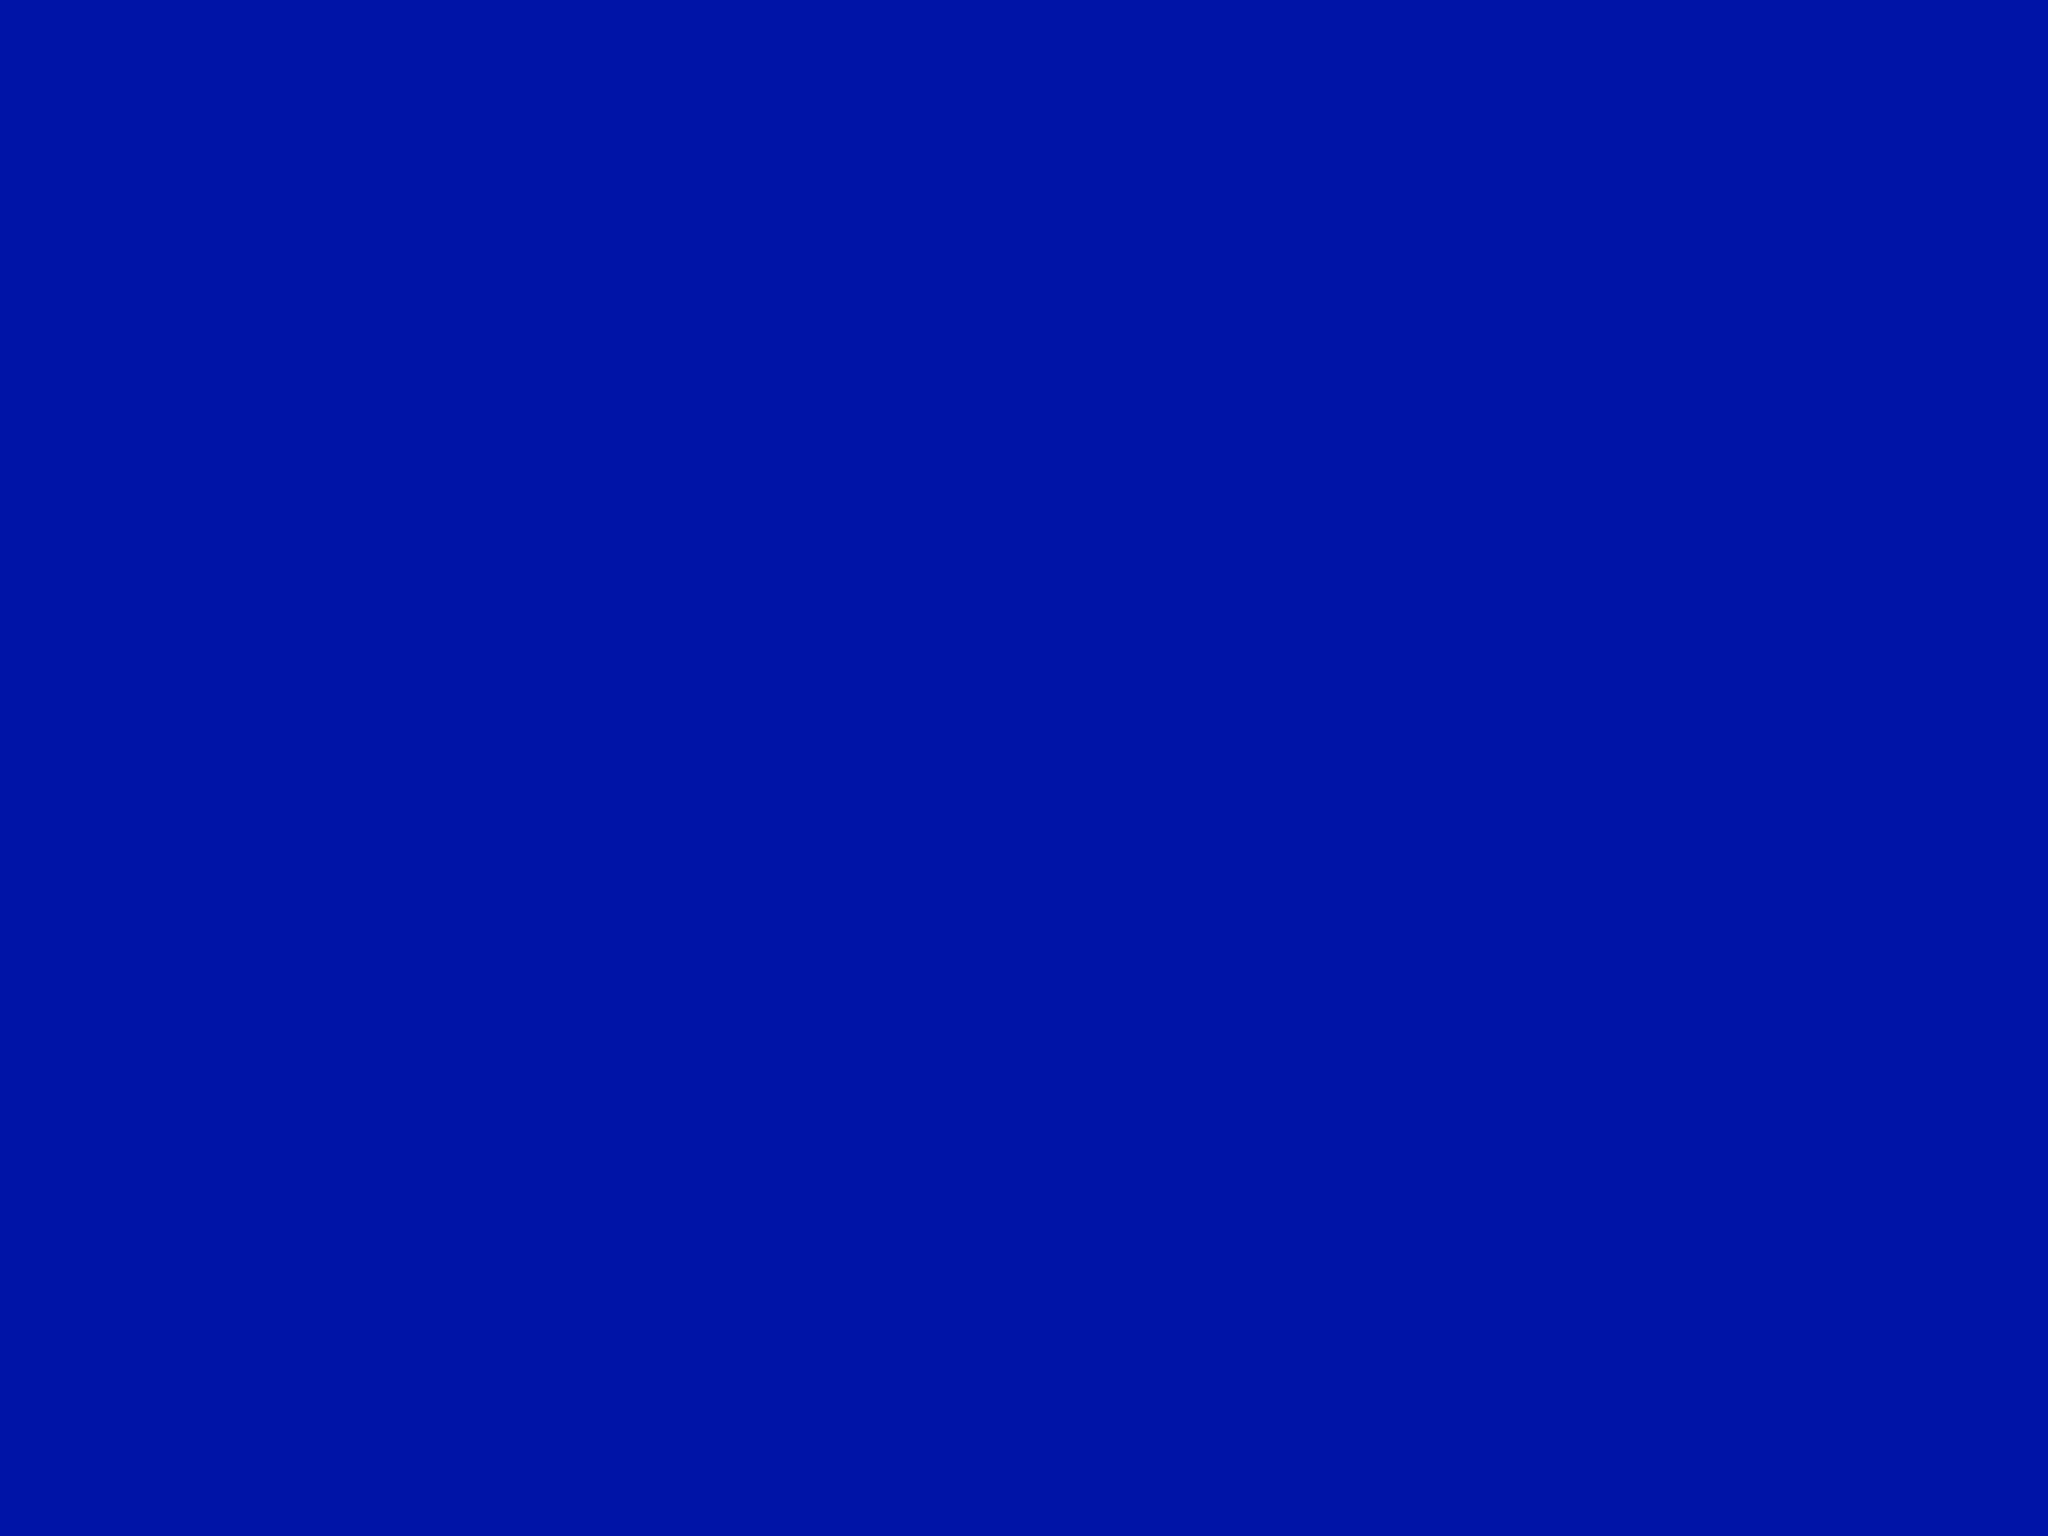 2048x1536 Zaffre Solid Color Background